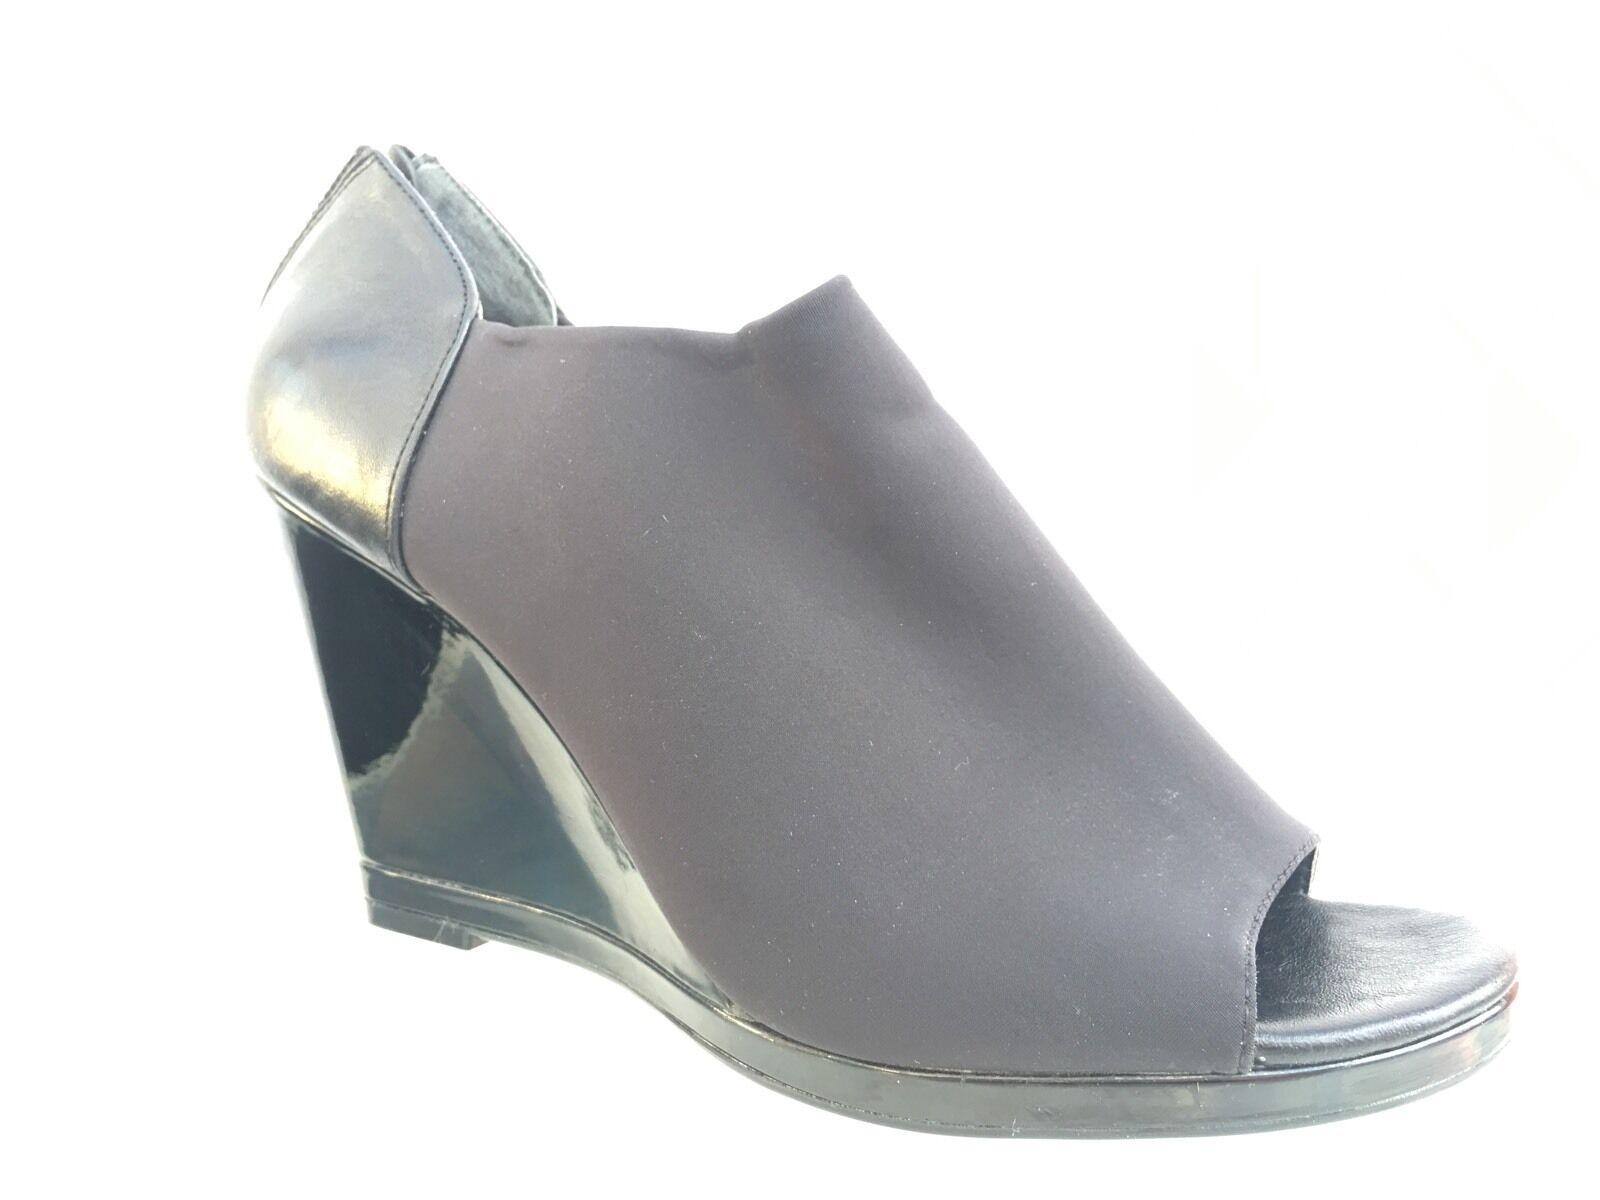 Donald J Pliner Hanna Negro Zapatos Zapatos Zapatos para mujer Talla 9 Nuevo  268 e5ae96